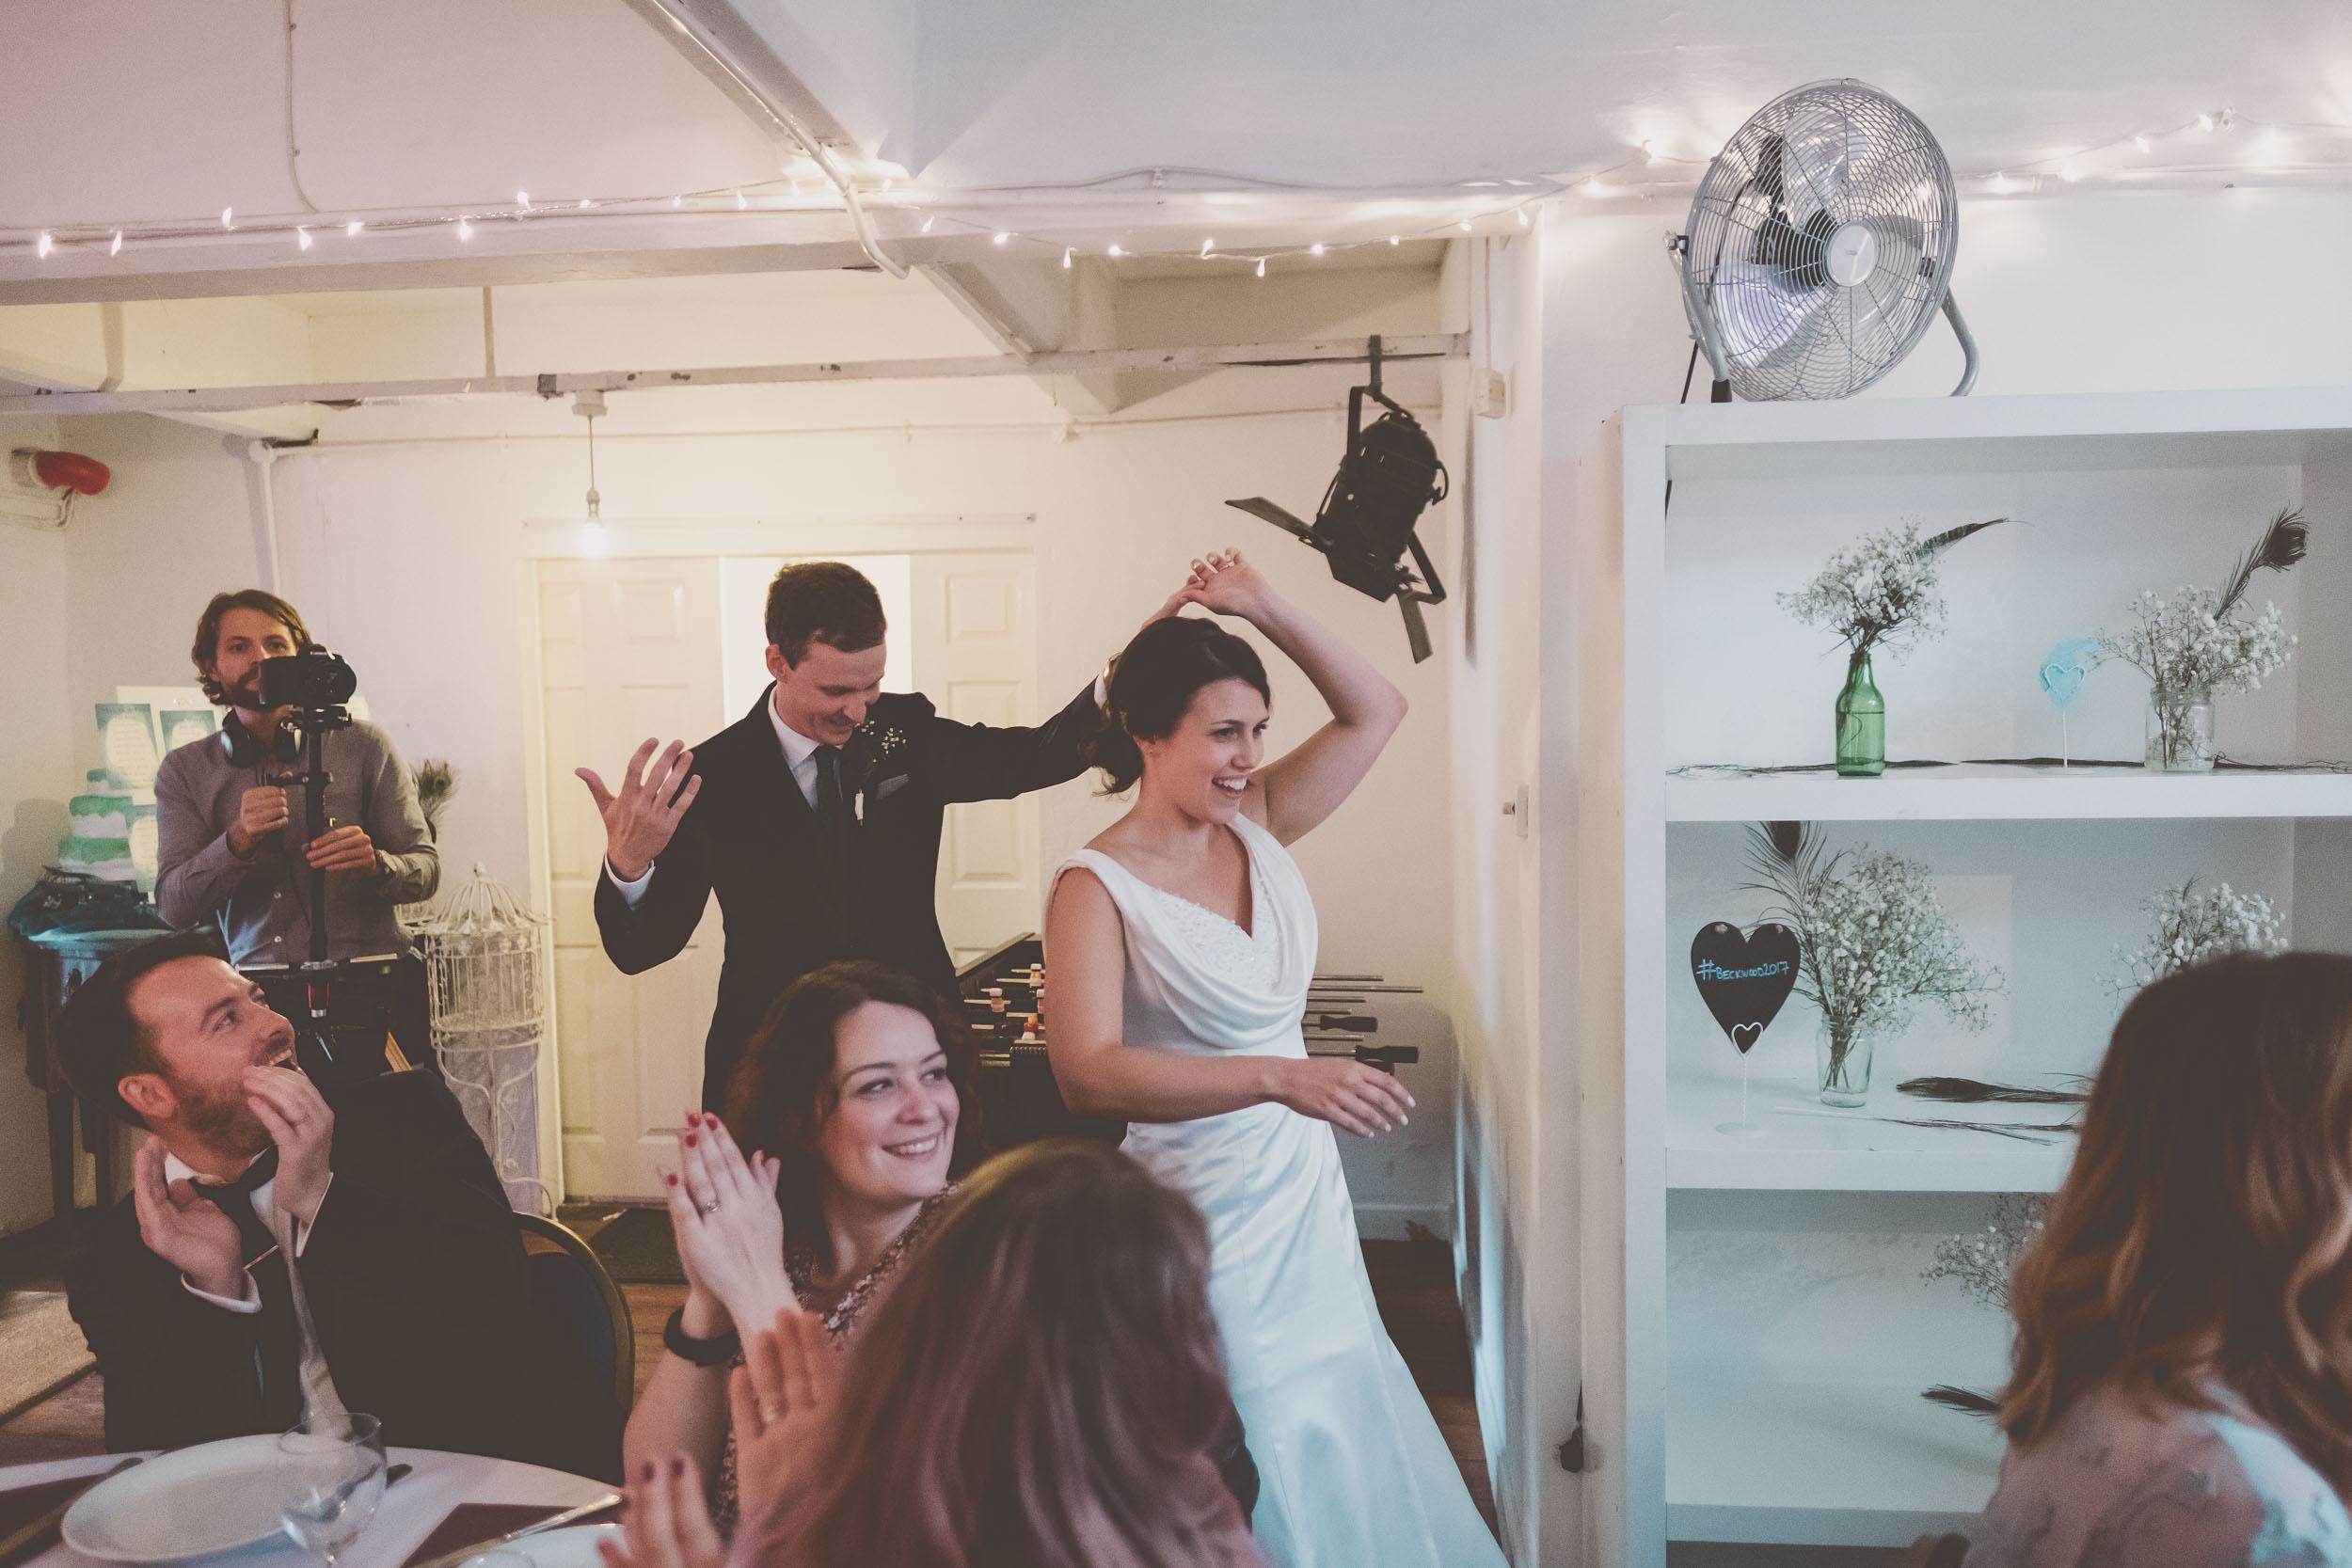 islington-town-hall-4th-floor-studios-wedding343.jpg